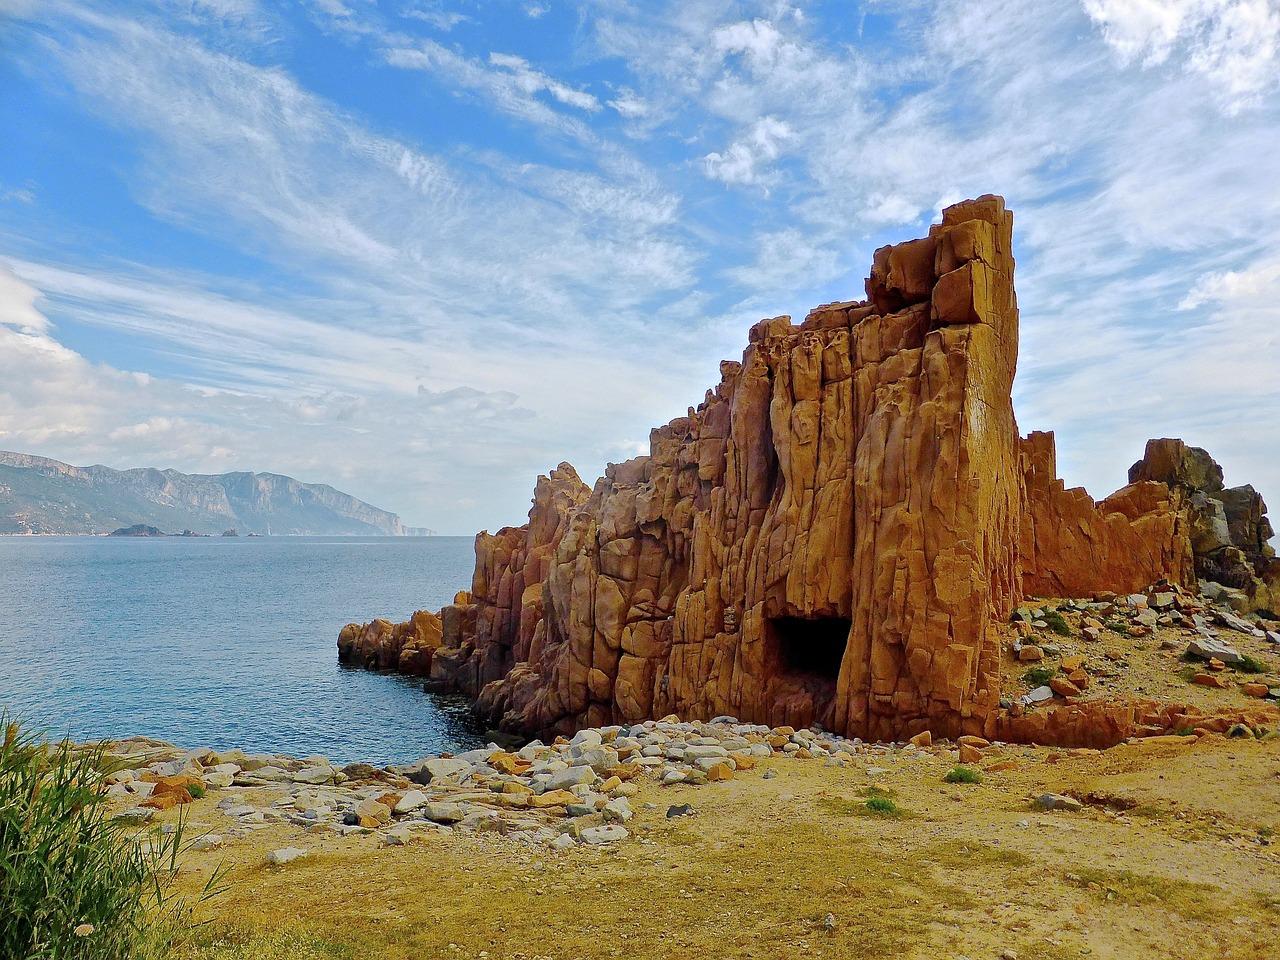 Sardegna sconosciuta